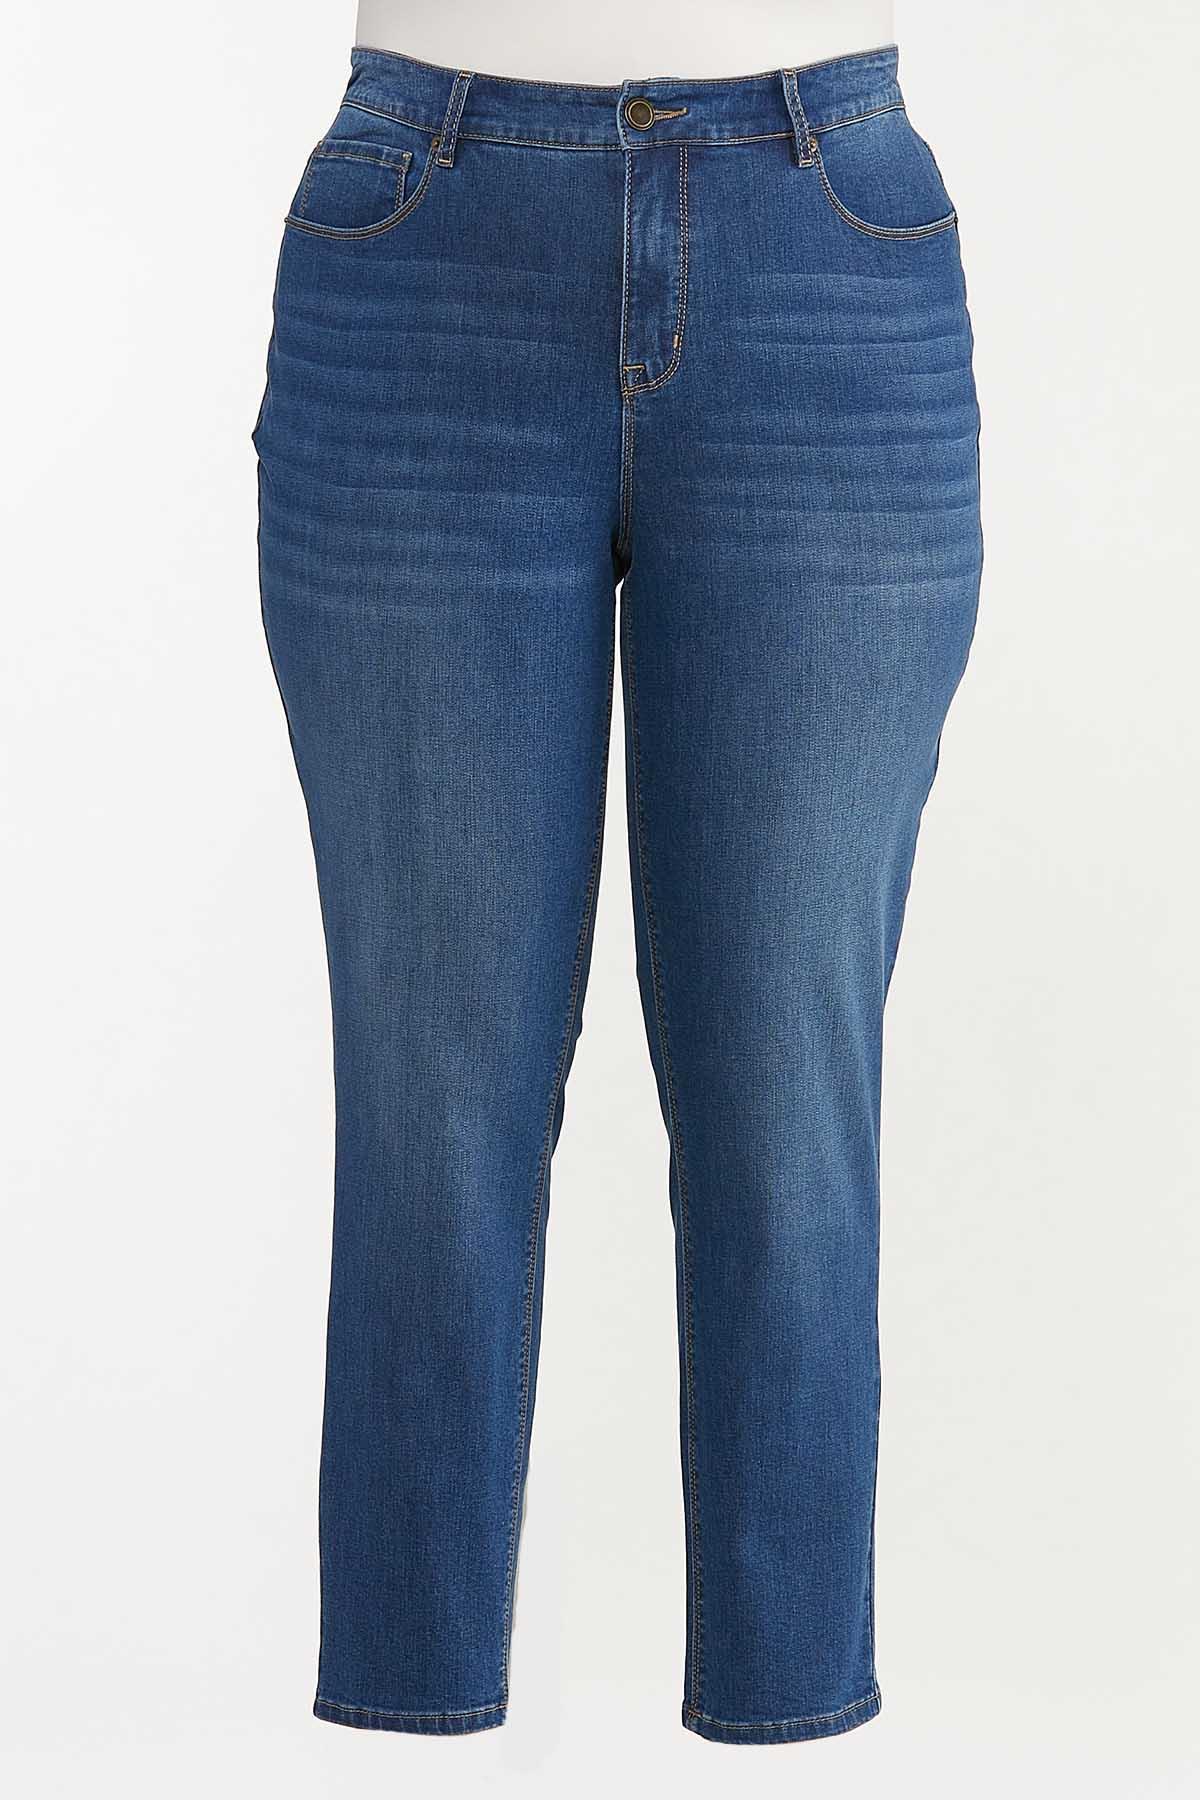 Plus Size Dark Wash Skinny Jeans (Item #44606652)